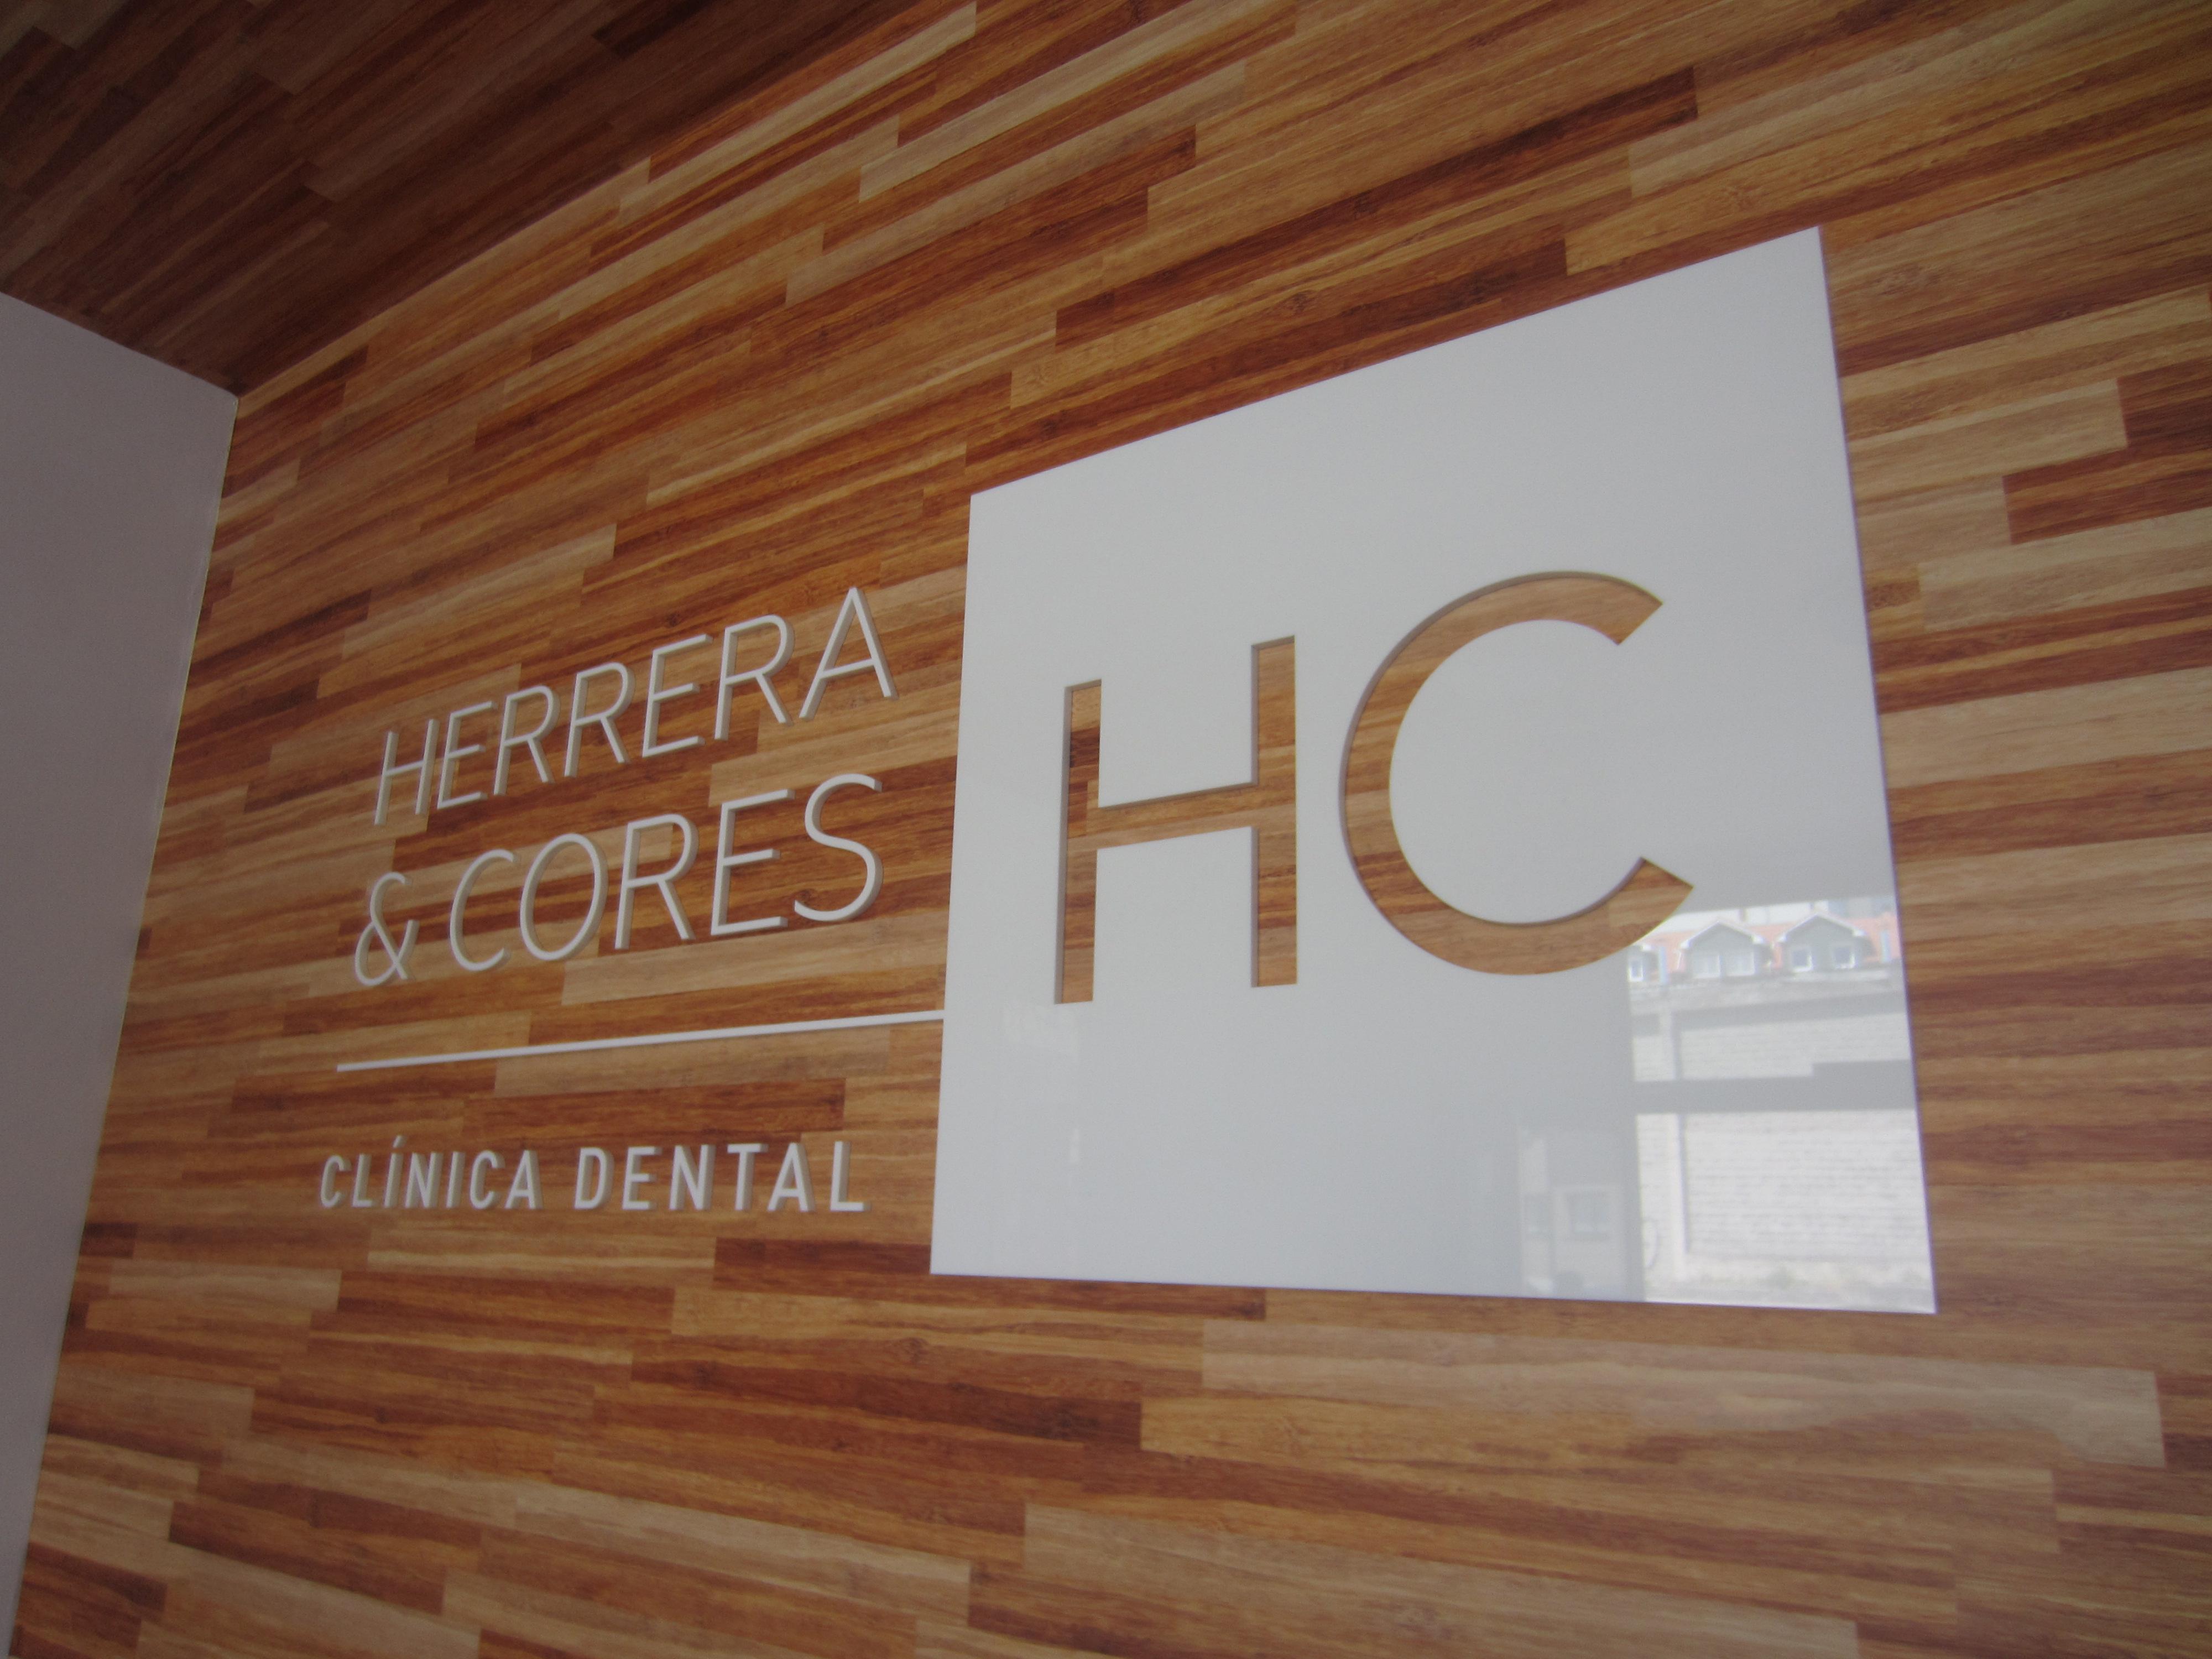 http://luzcoruna.es/wp-content/uploads/2020/03/Clinica-Dental_Herrea-Cores-9.jpg